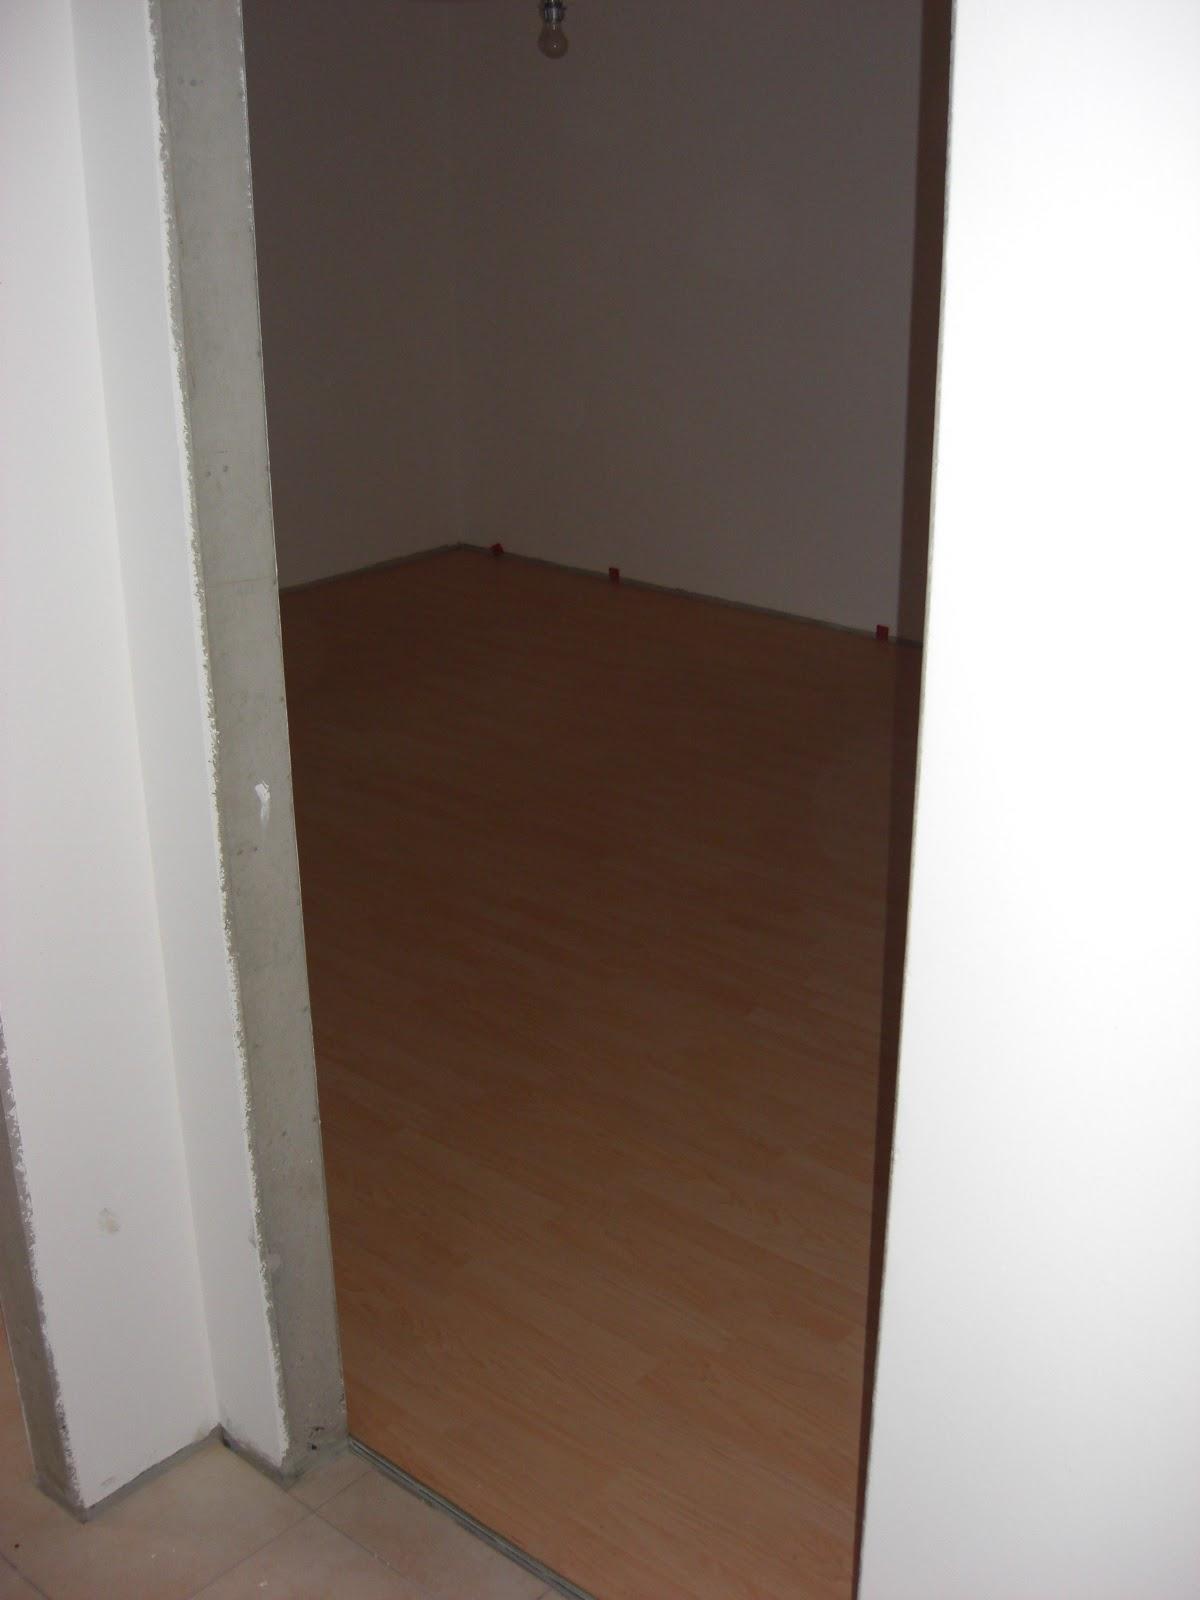 hausnummer 49 laminatboden im keller. Black Bedroom Furniture Sets. Home Design Ideas